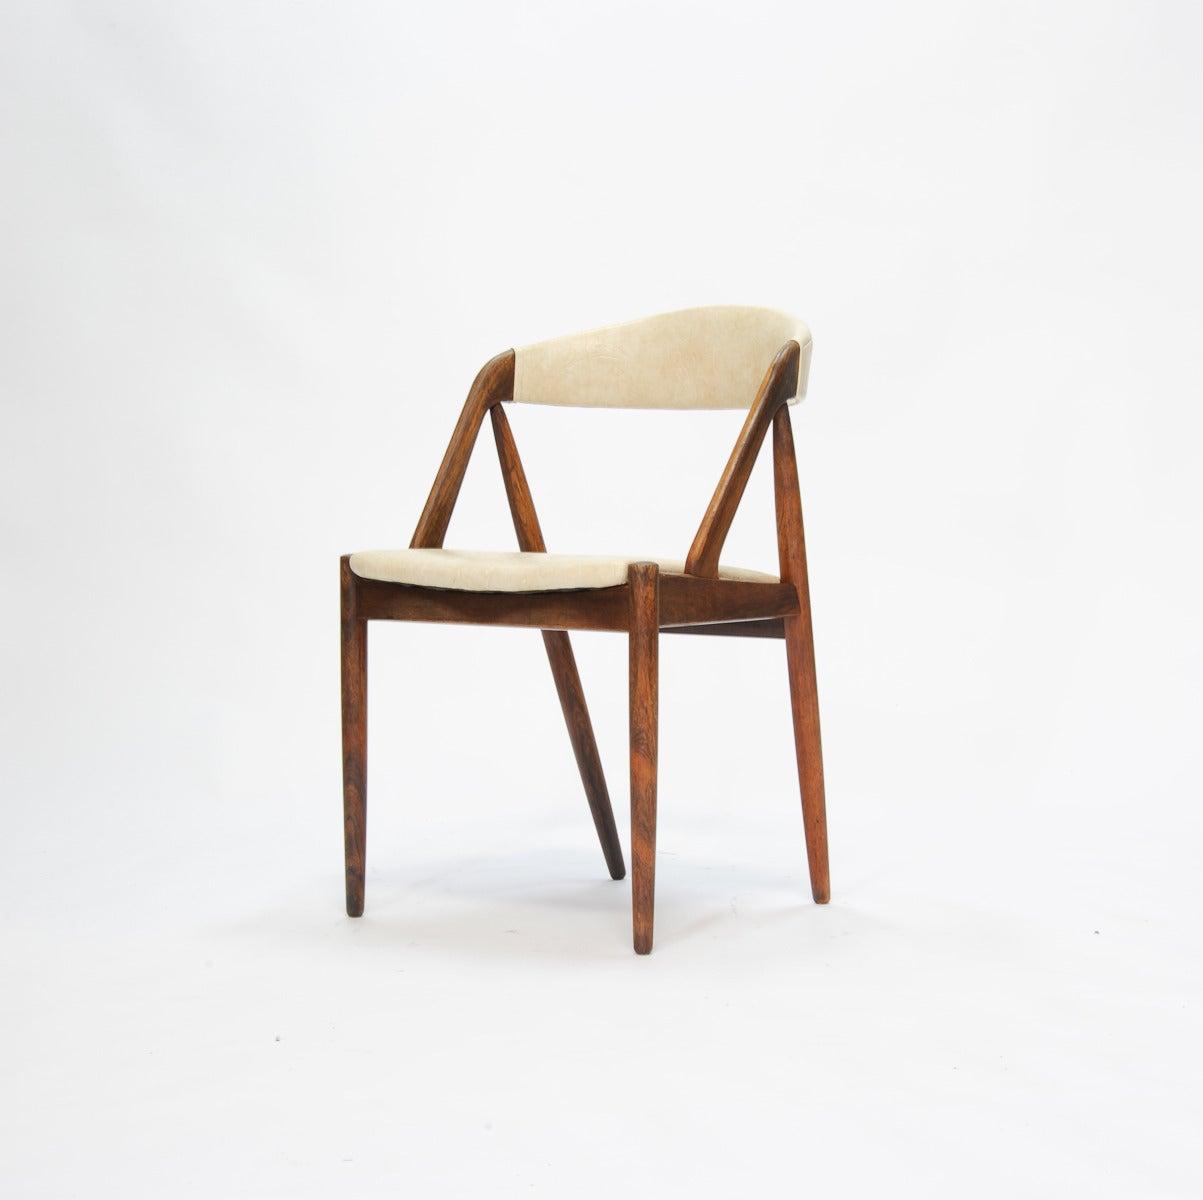 Set of four rosewood kai kristiansen dining chairs at 1stdibs - Kai kristiansen chair ...